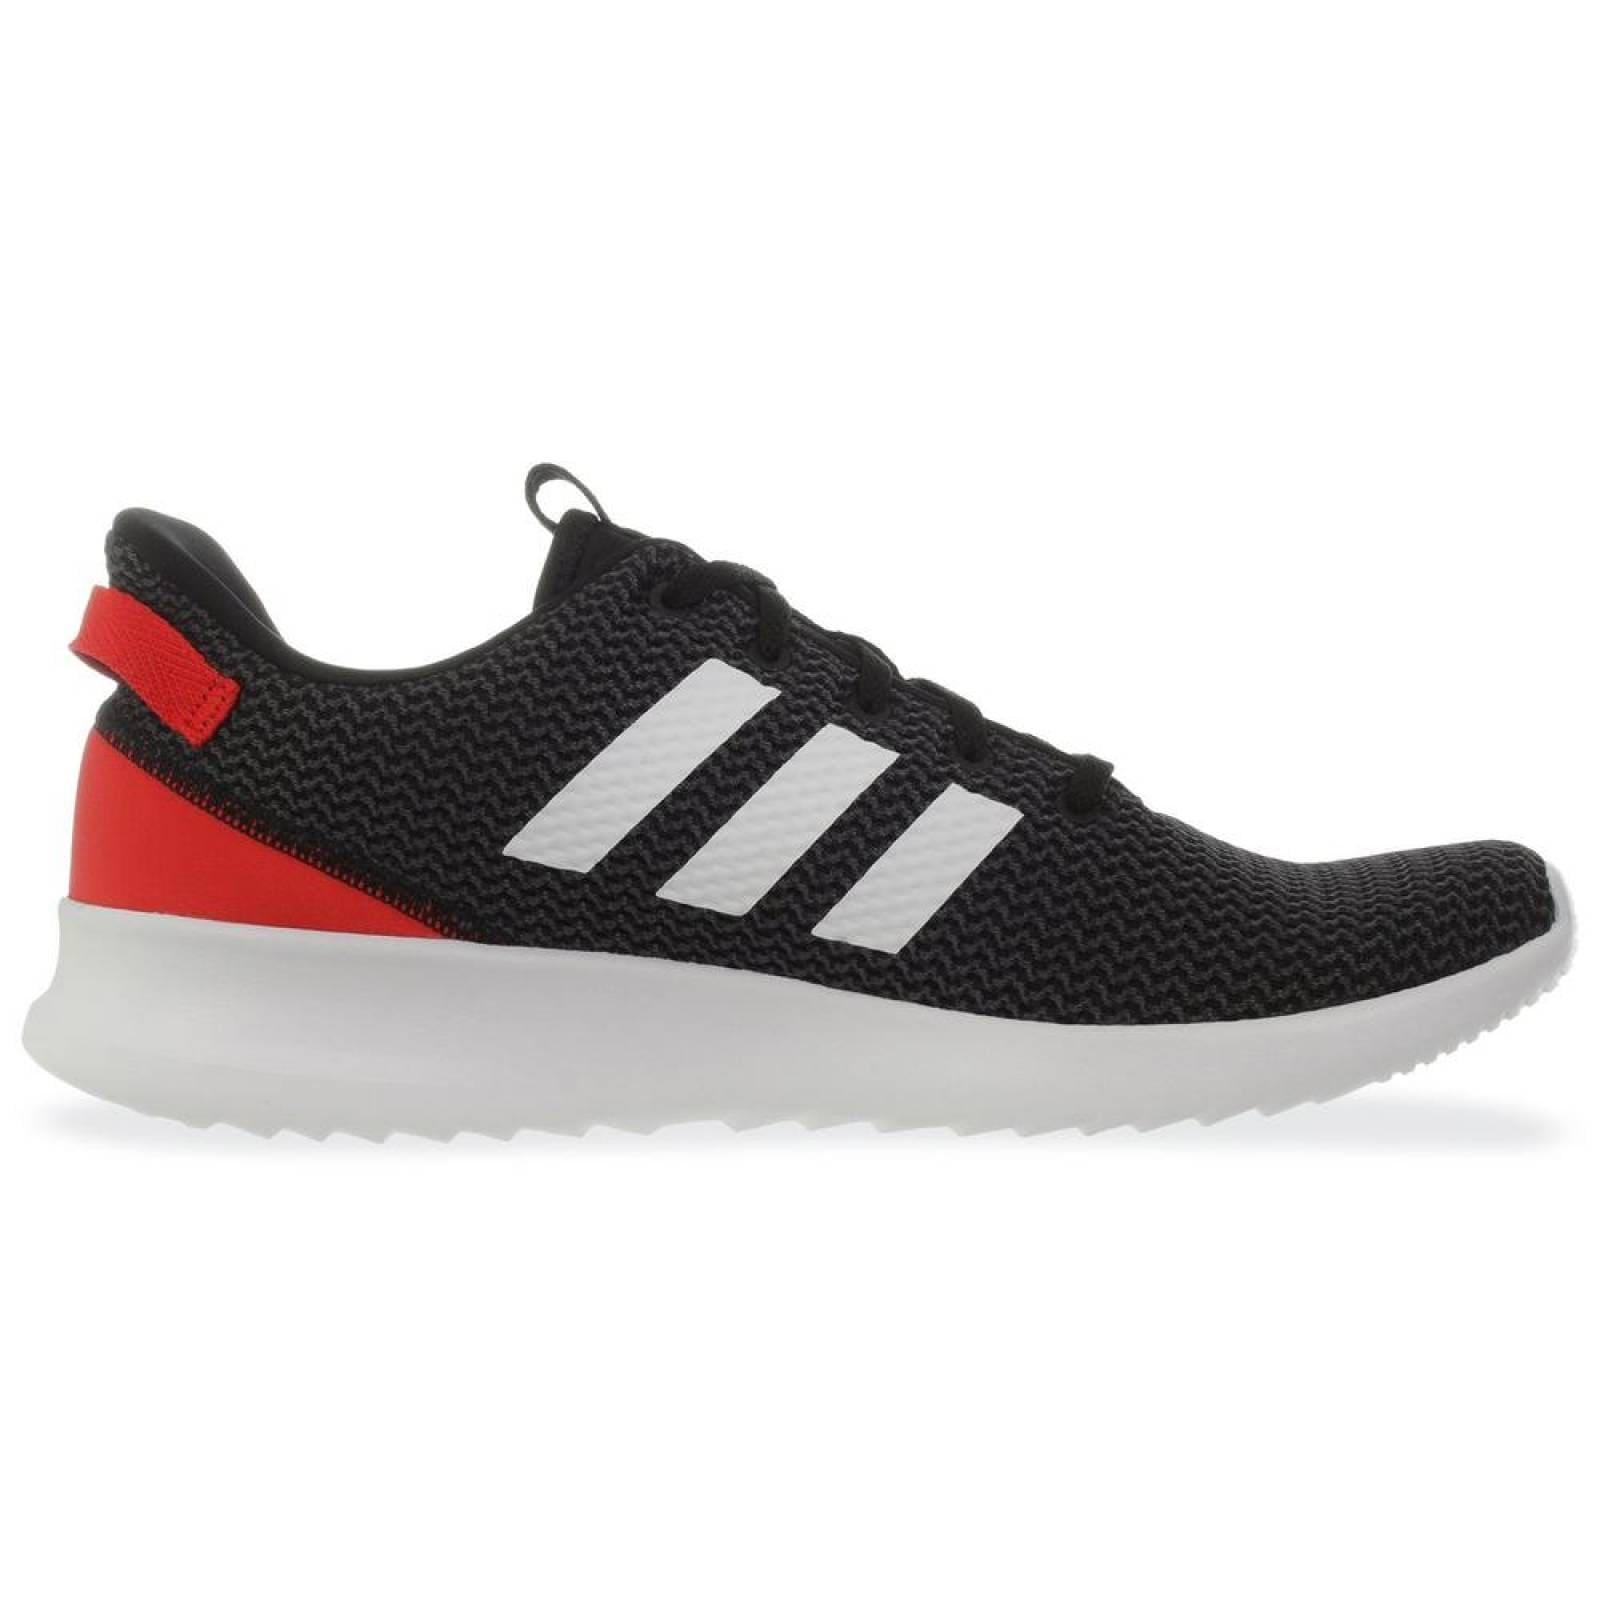 Tenis Adidas CF Racer TR B43638 Gris Obscuro Hombre